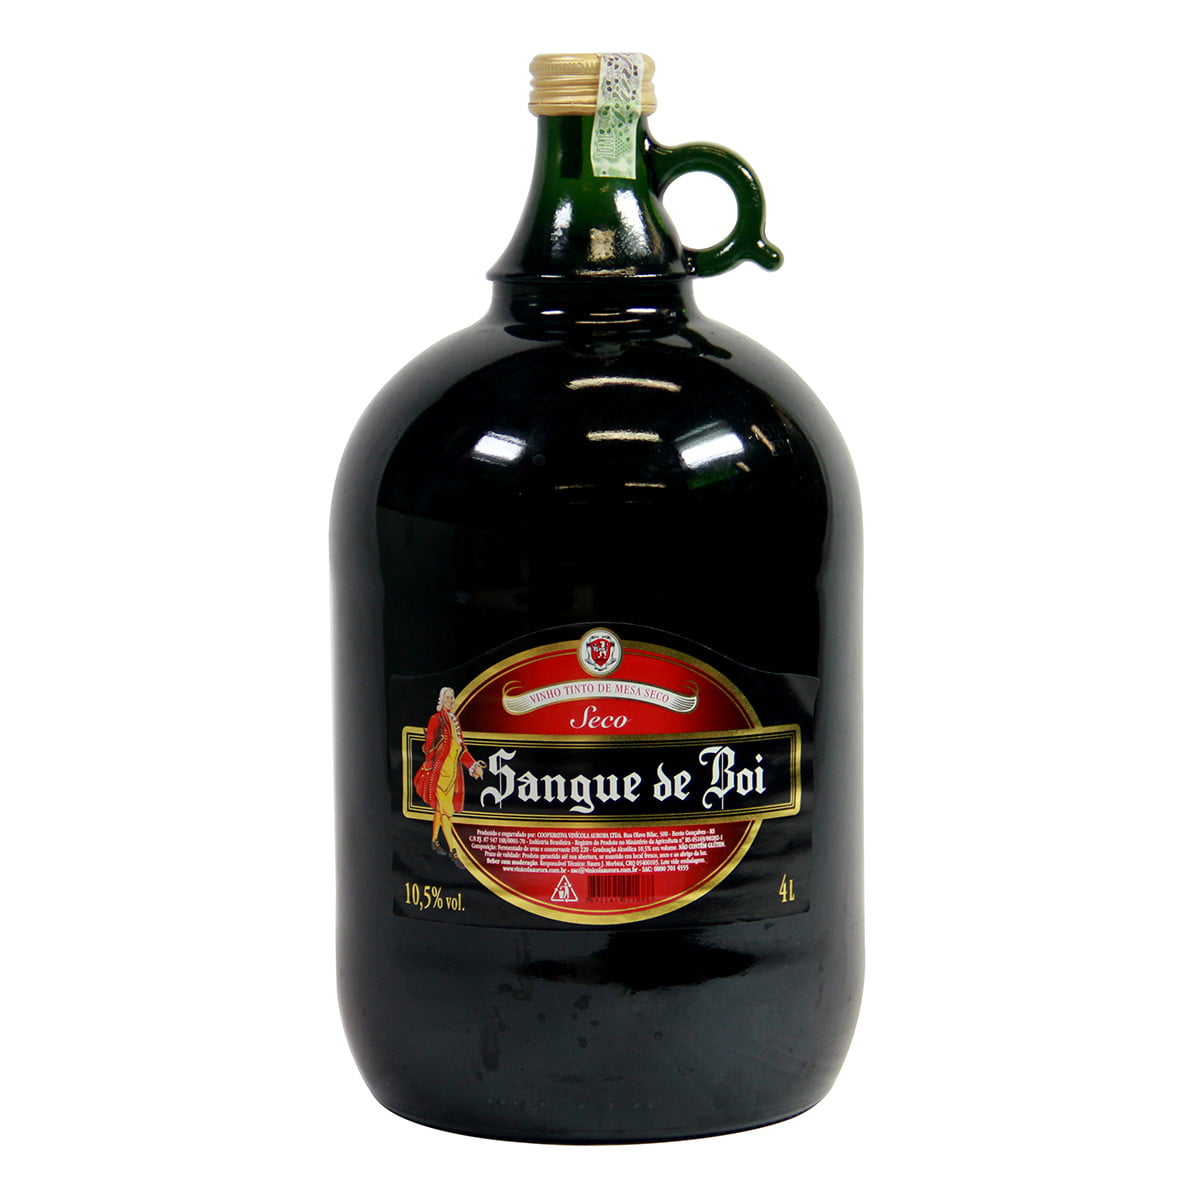 Vinho Aurora Sangue de Boi Tinto Seco 4 Lts